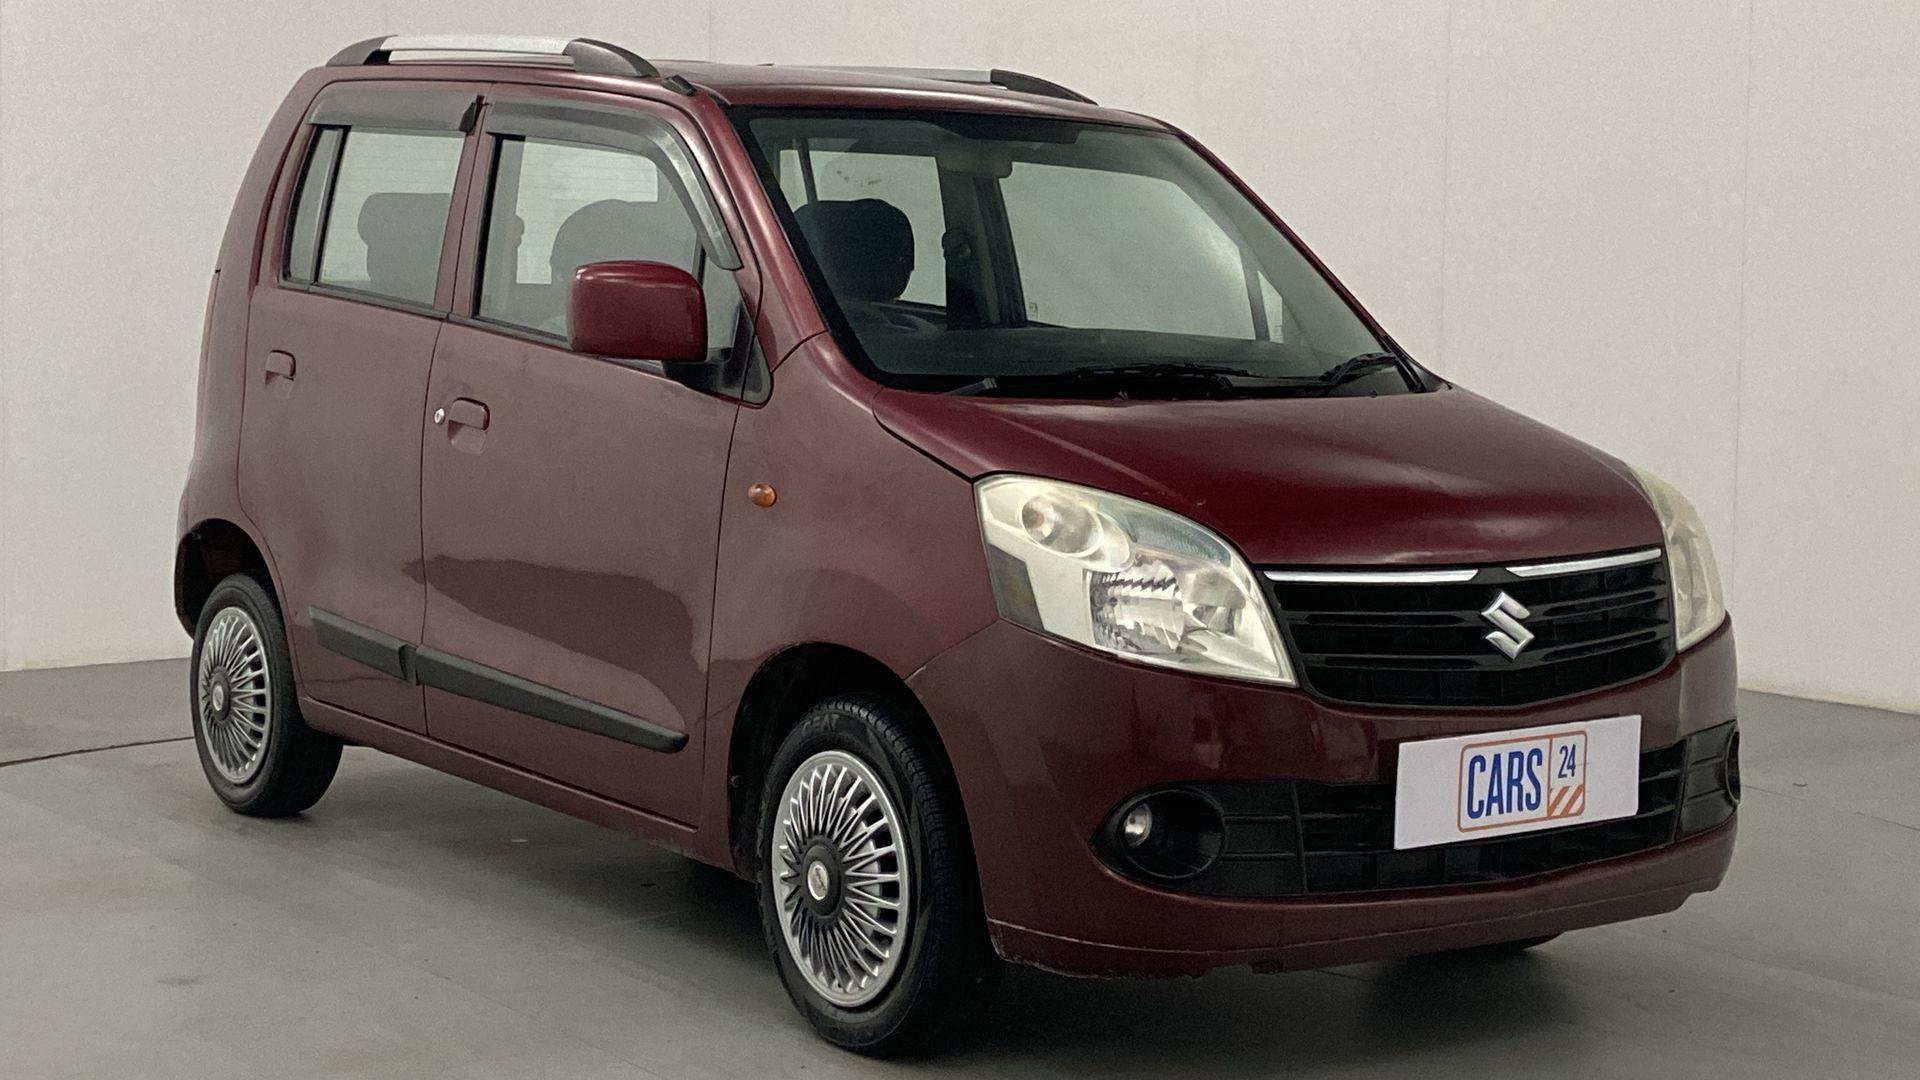 2012 Maruti Wagon R 1.0 VXI